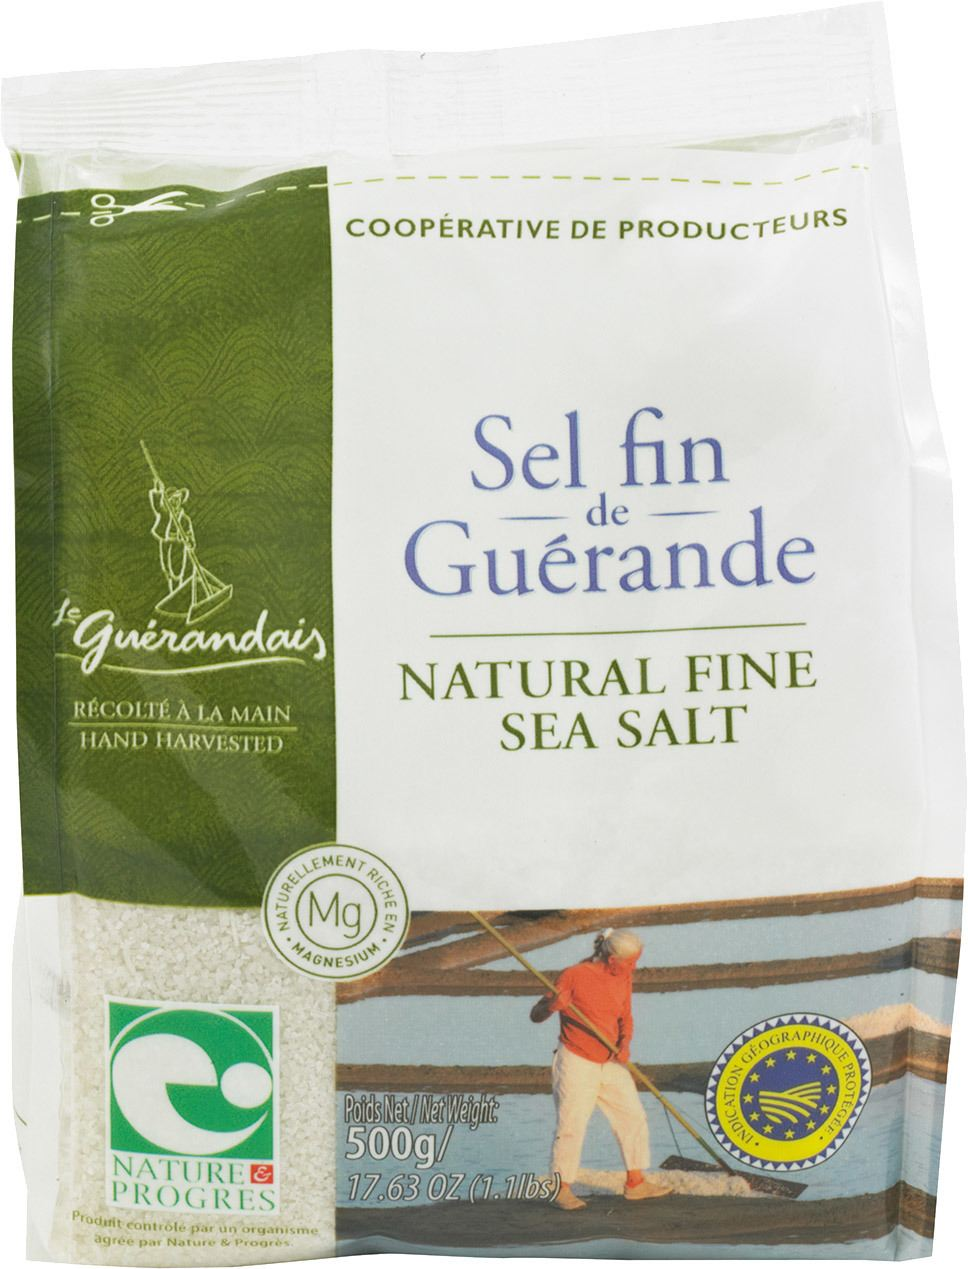 Biologische Le Guérandais Zeezout fijn in zak 500 gr